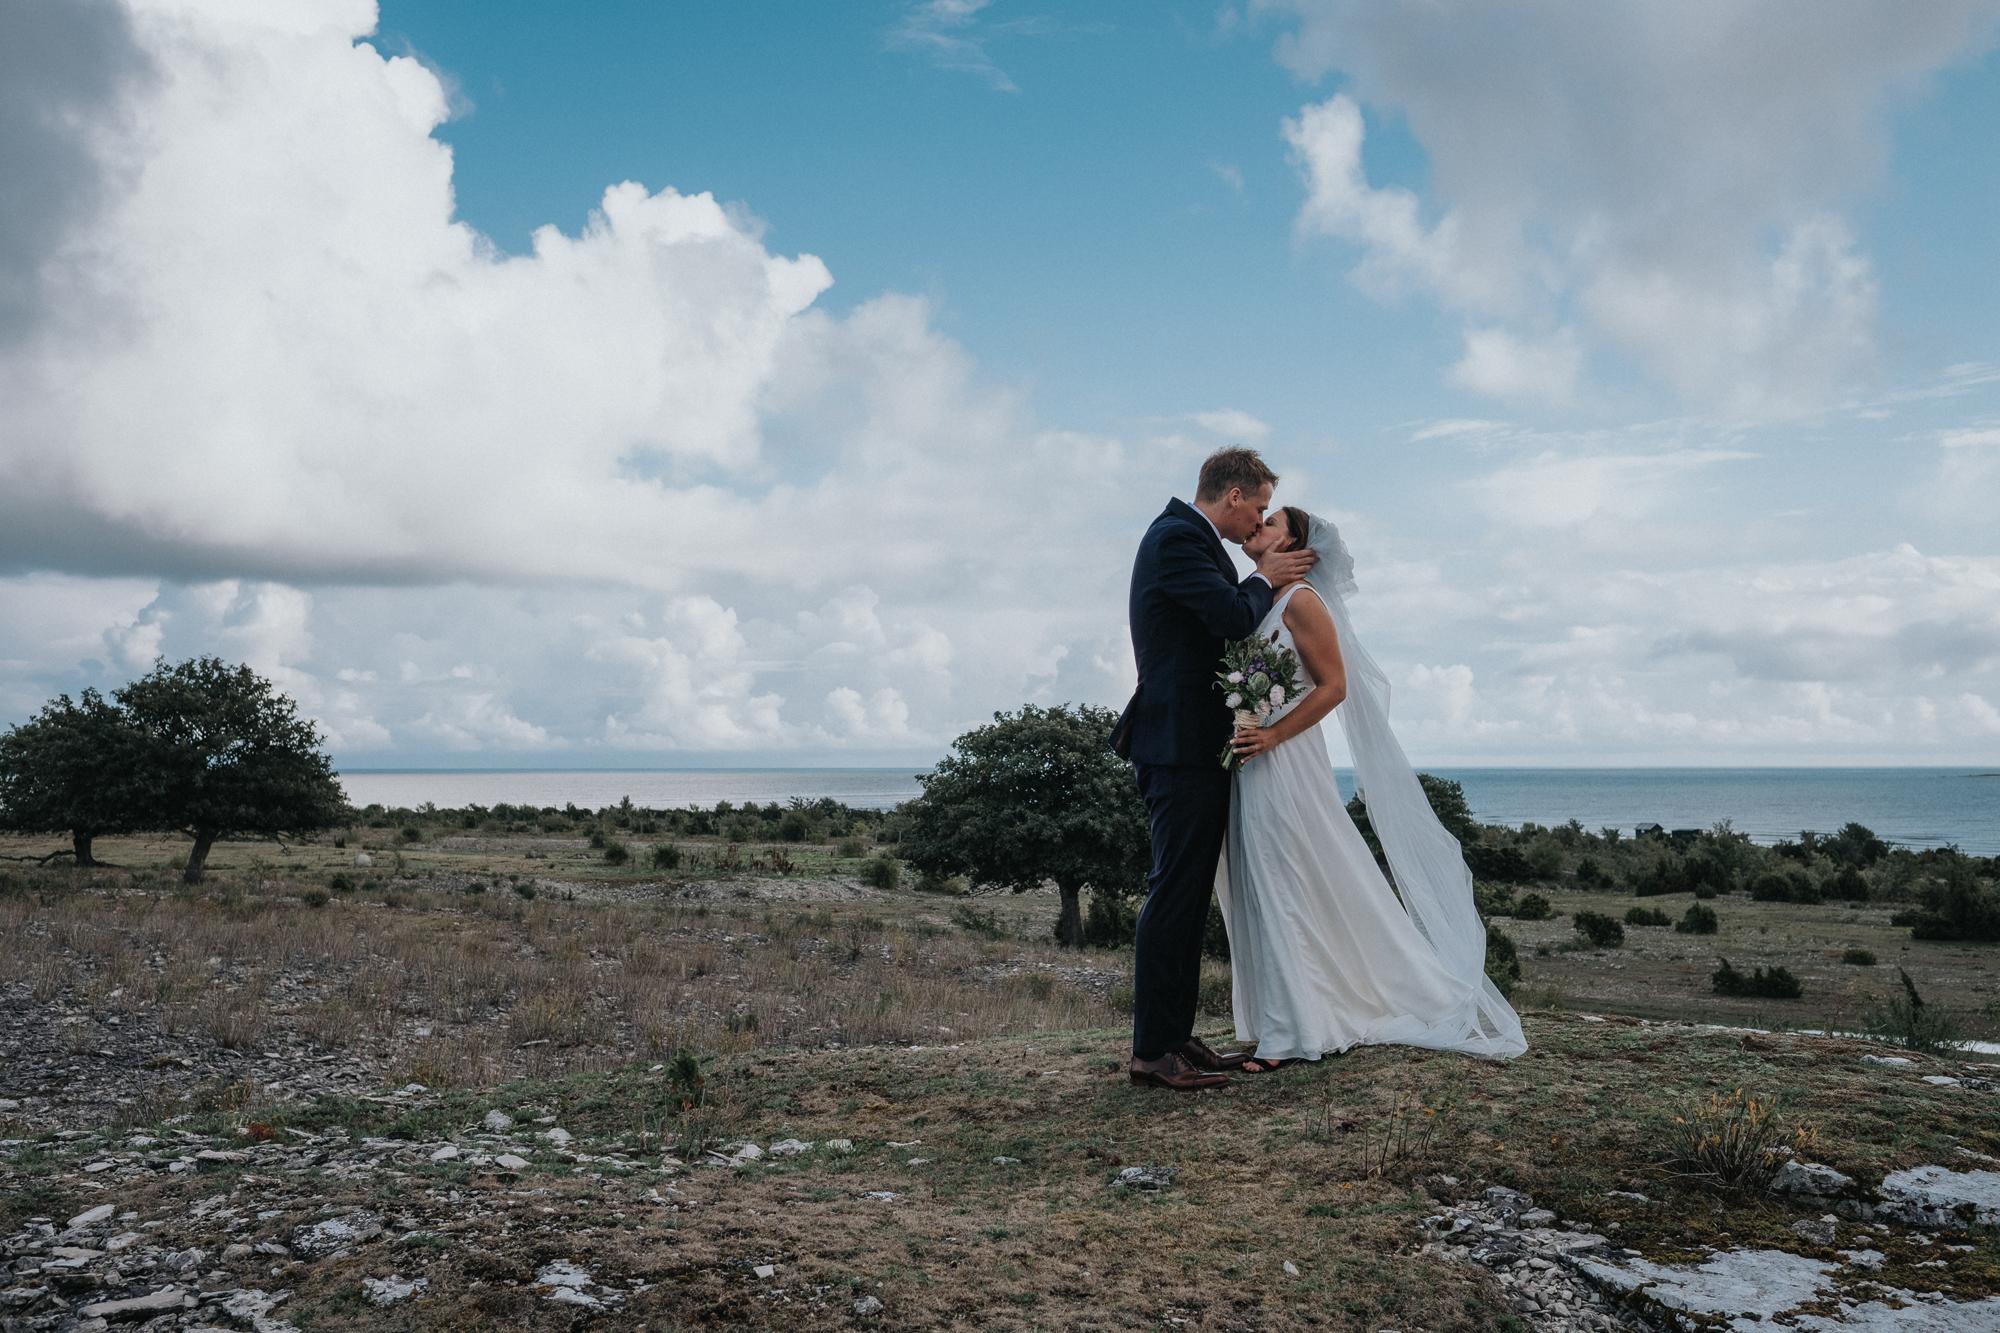 036-bröllopsfotograf-fårö-neas-fotografi.jpg